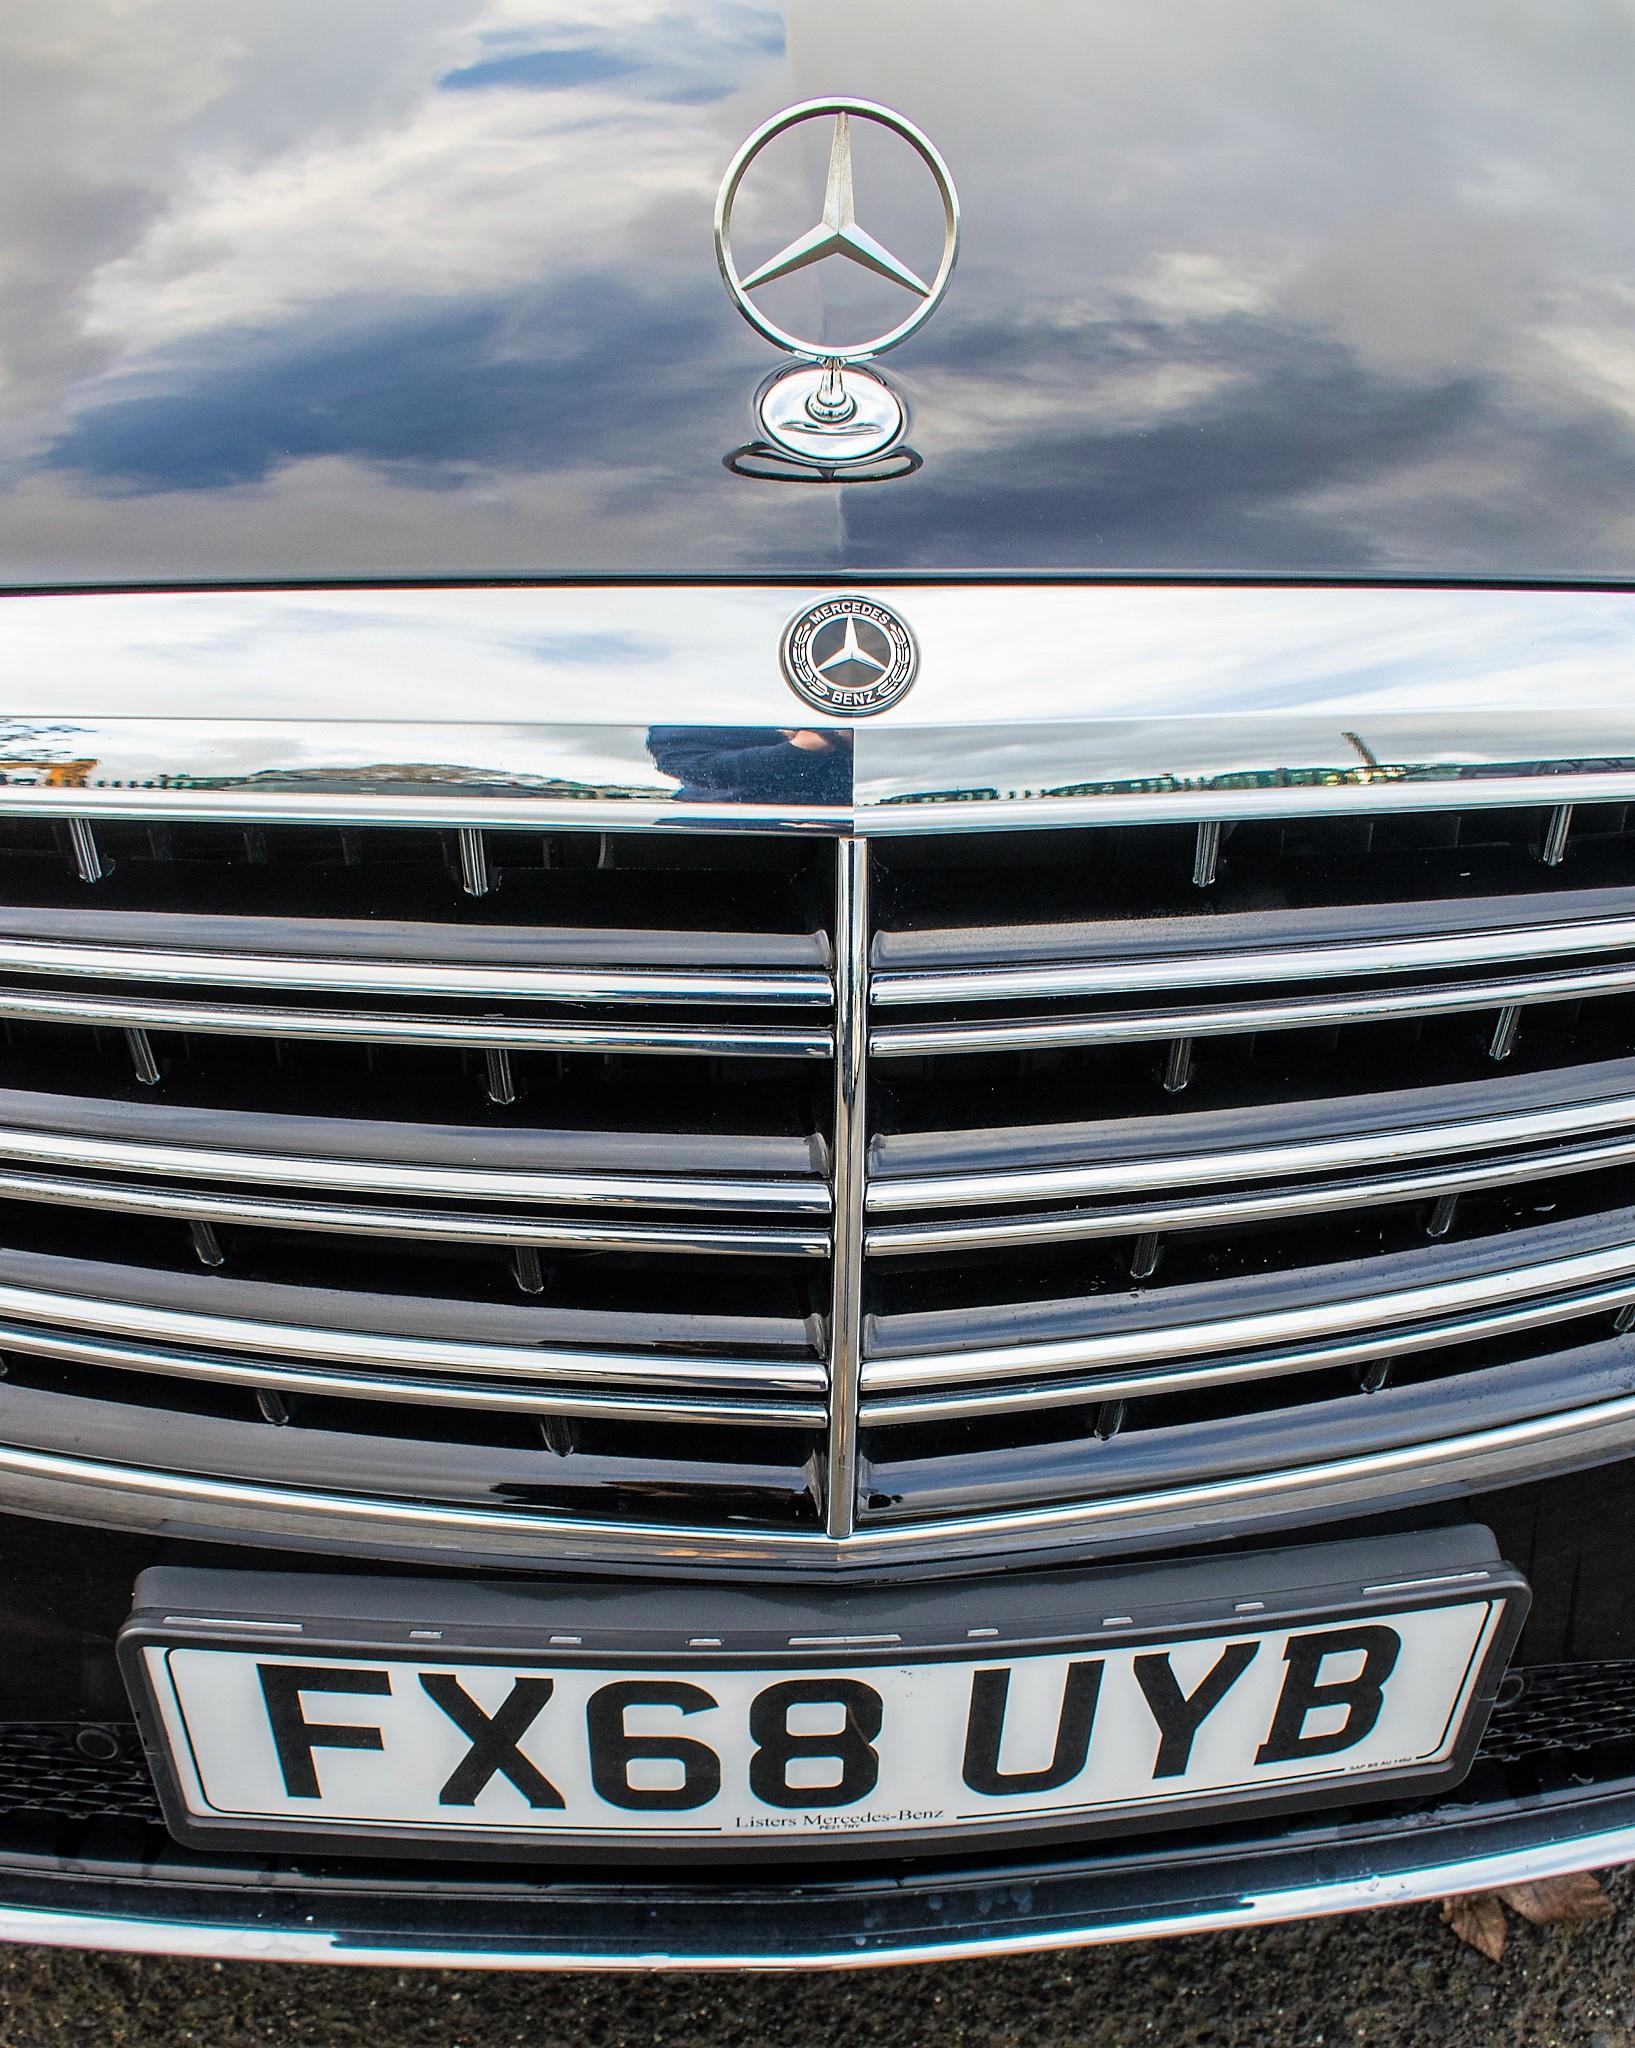 Mercedes Benz S450 L AMG Line Executive auto petrol 4 door saloon car Registration Number: FX68 - Image 18 of 33